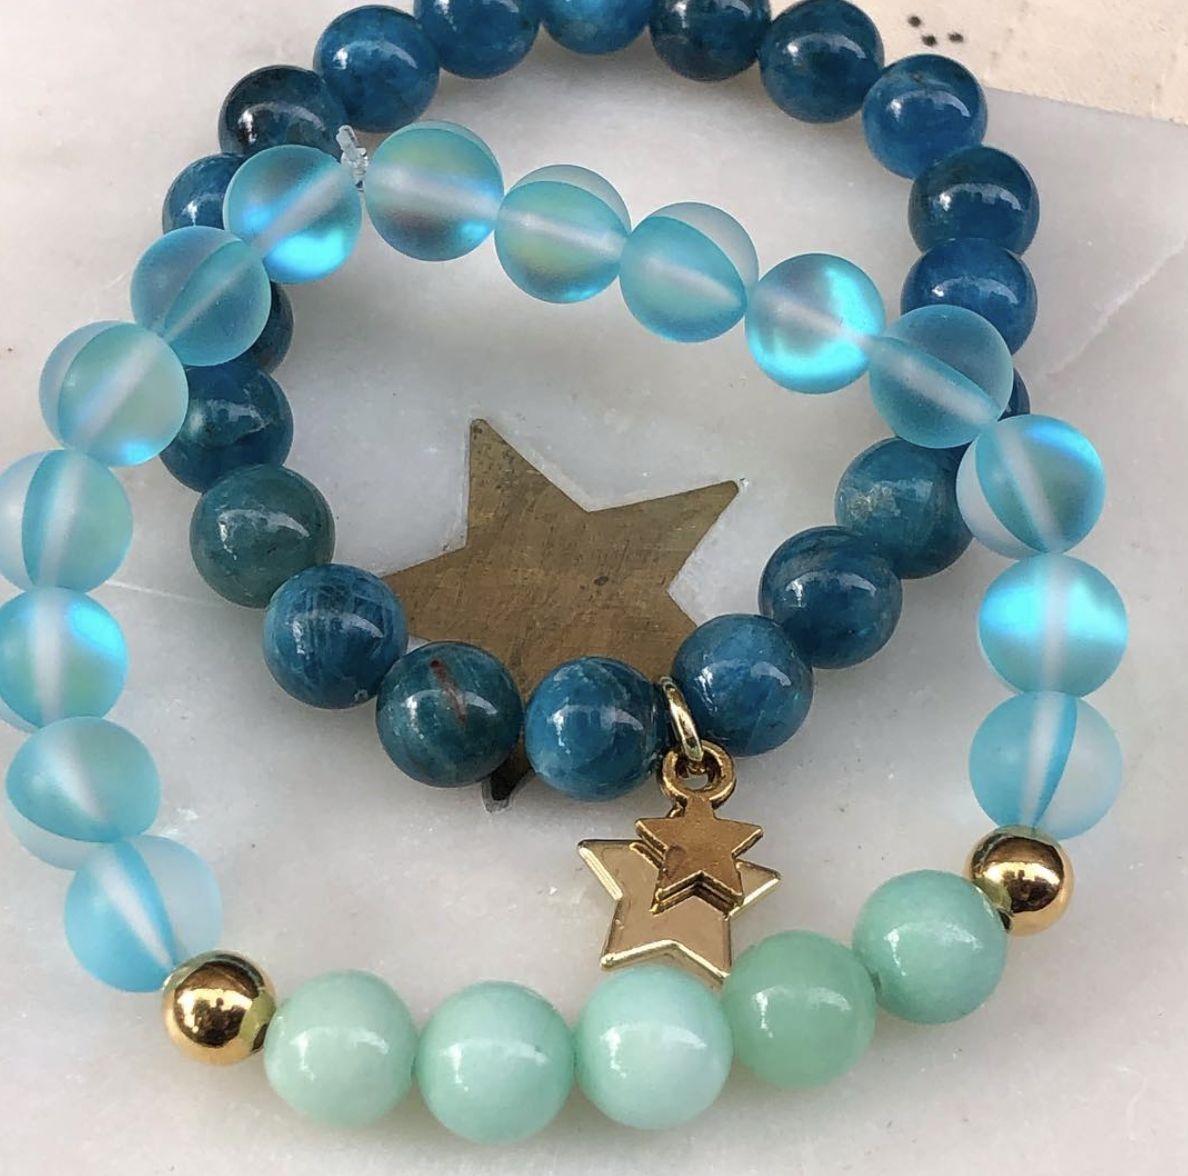 Empress Mala Designs, Apatite Mala Bead Bracelet, Aqua Aura Quartz Mala Bead Bracelet